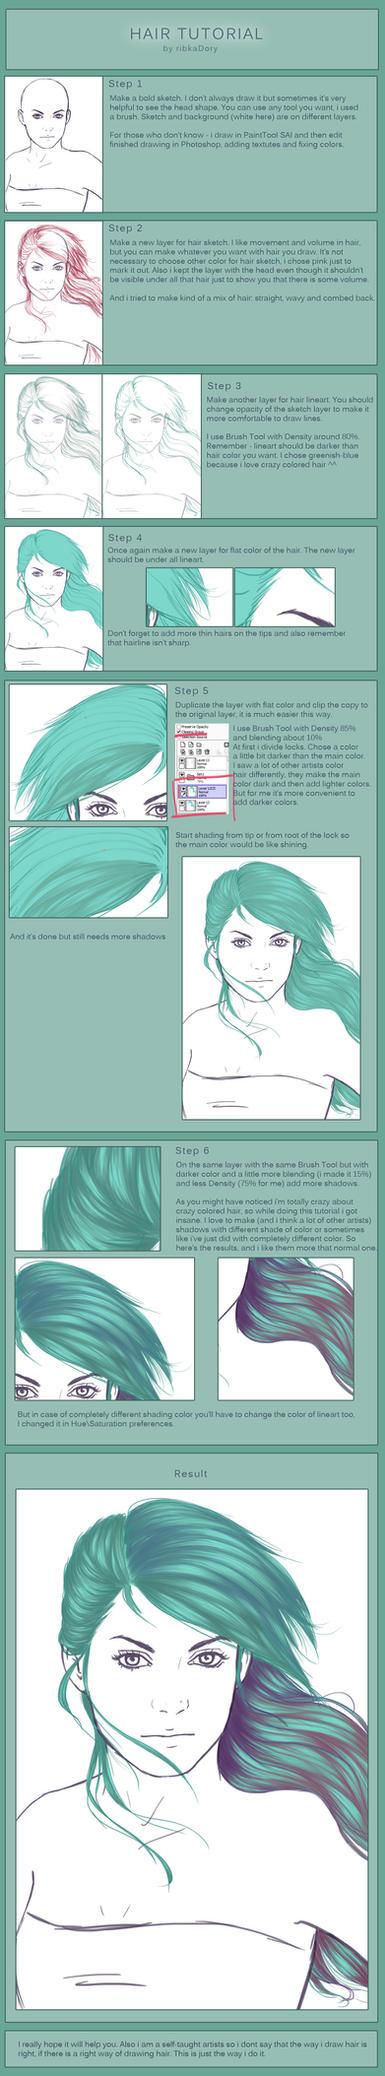 Hair Tutorial by ribkaDory